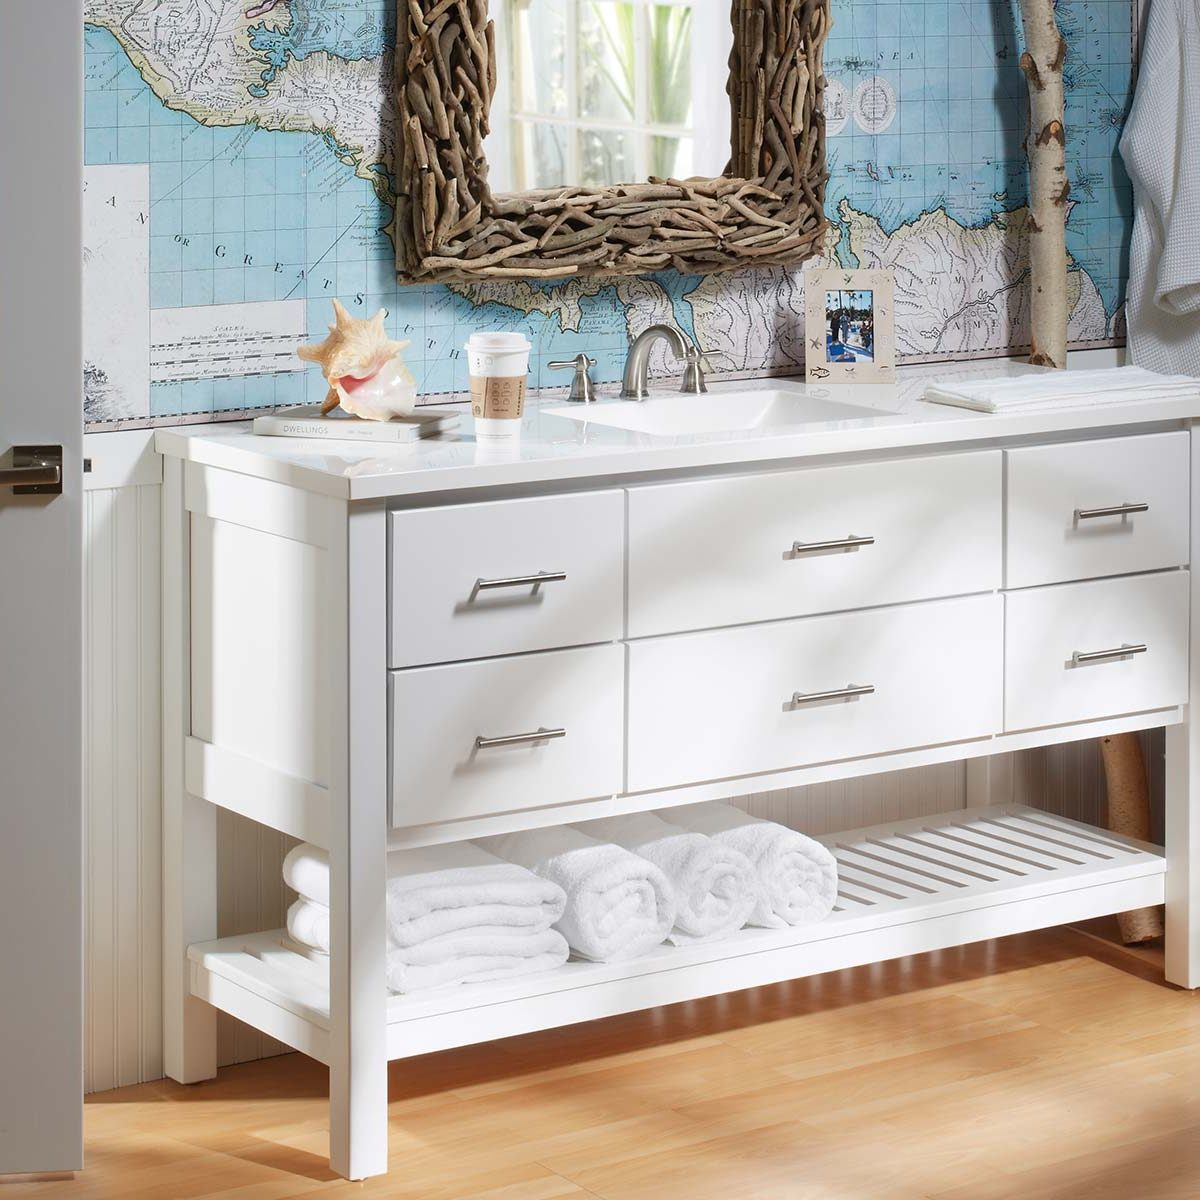 Interlude-white-6-drawer-overall-horiz